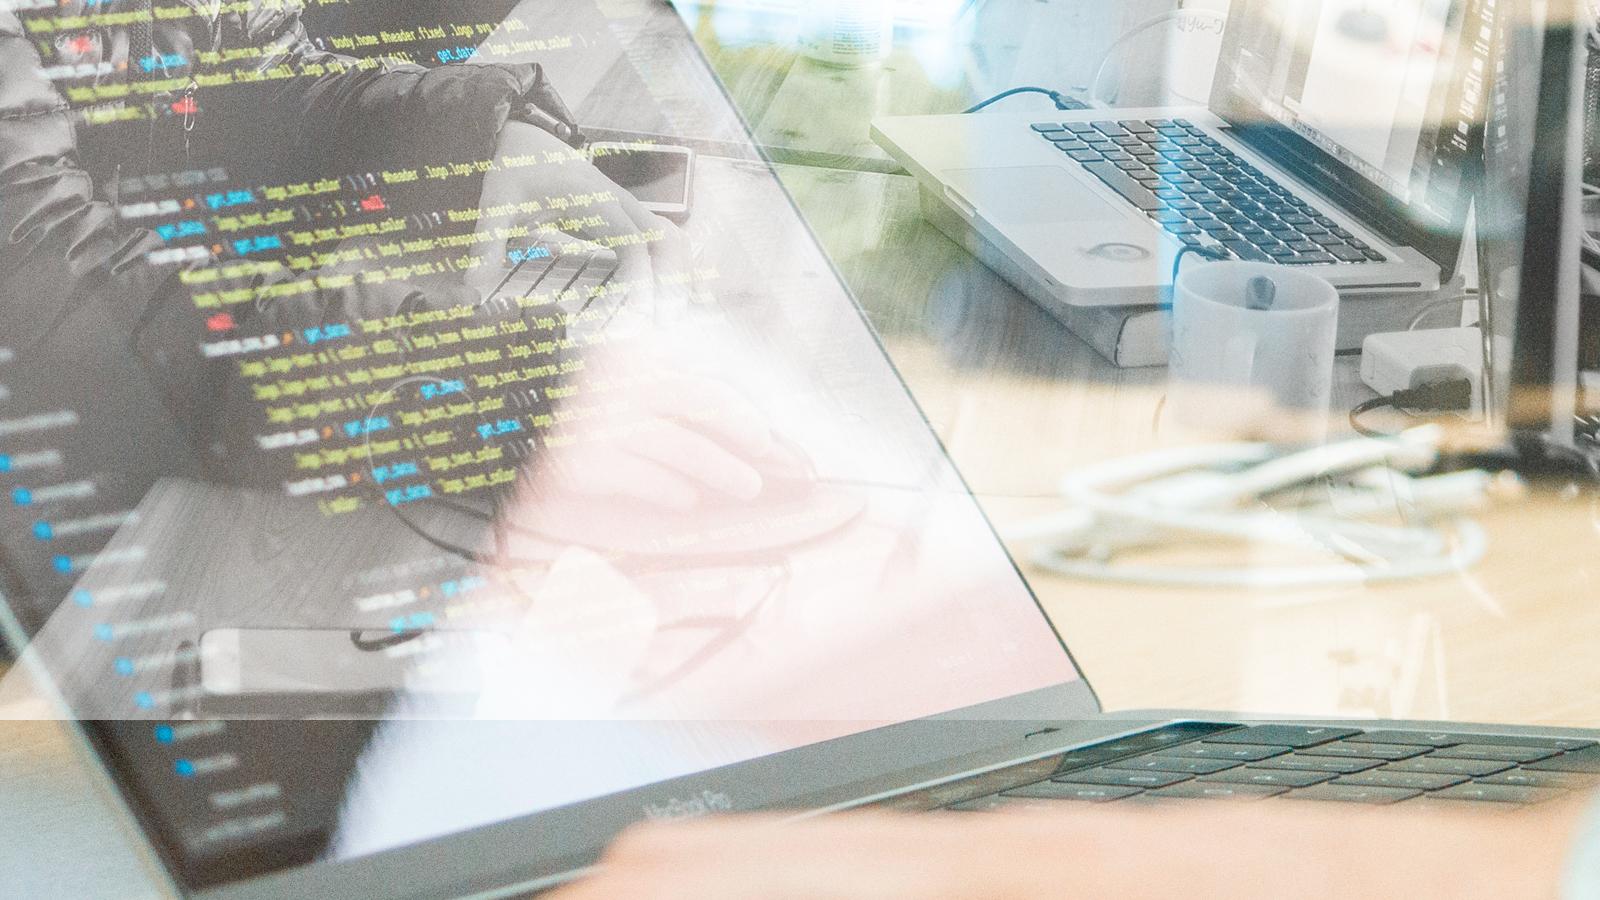 Desenvolupament d'aplicacions multiplataforma